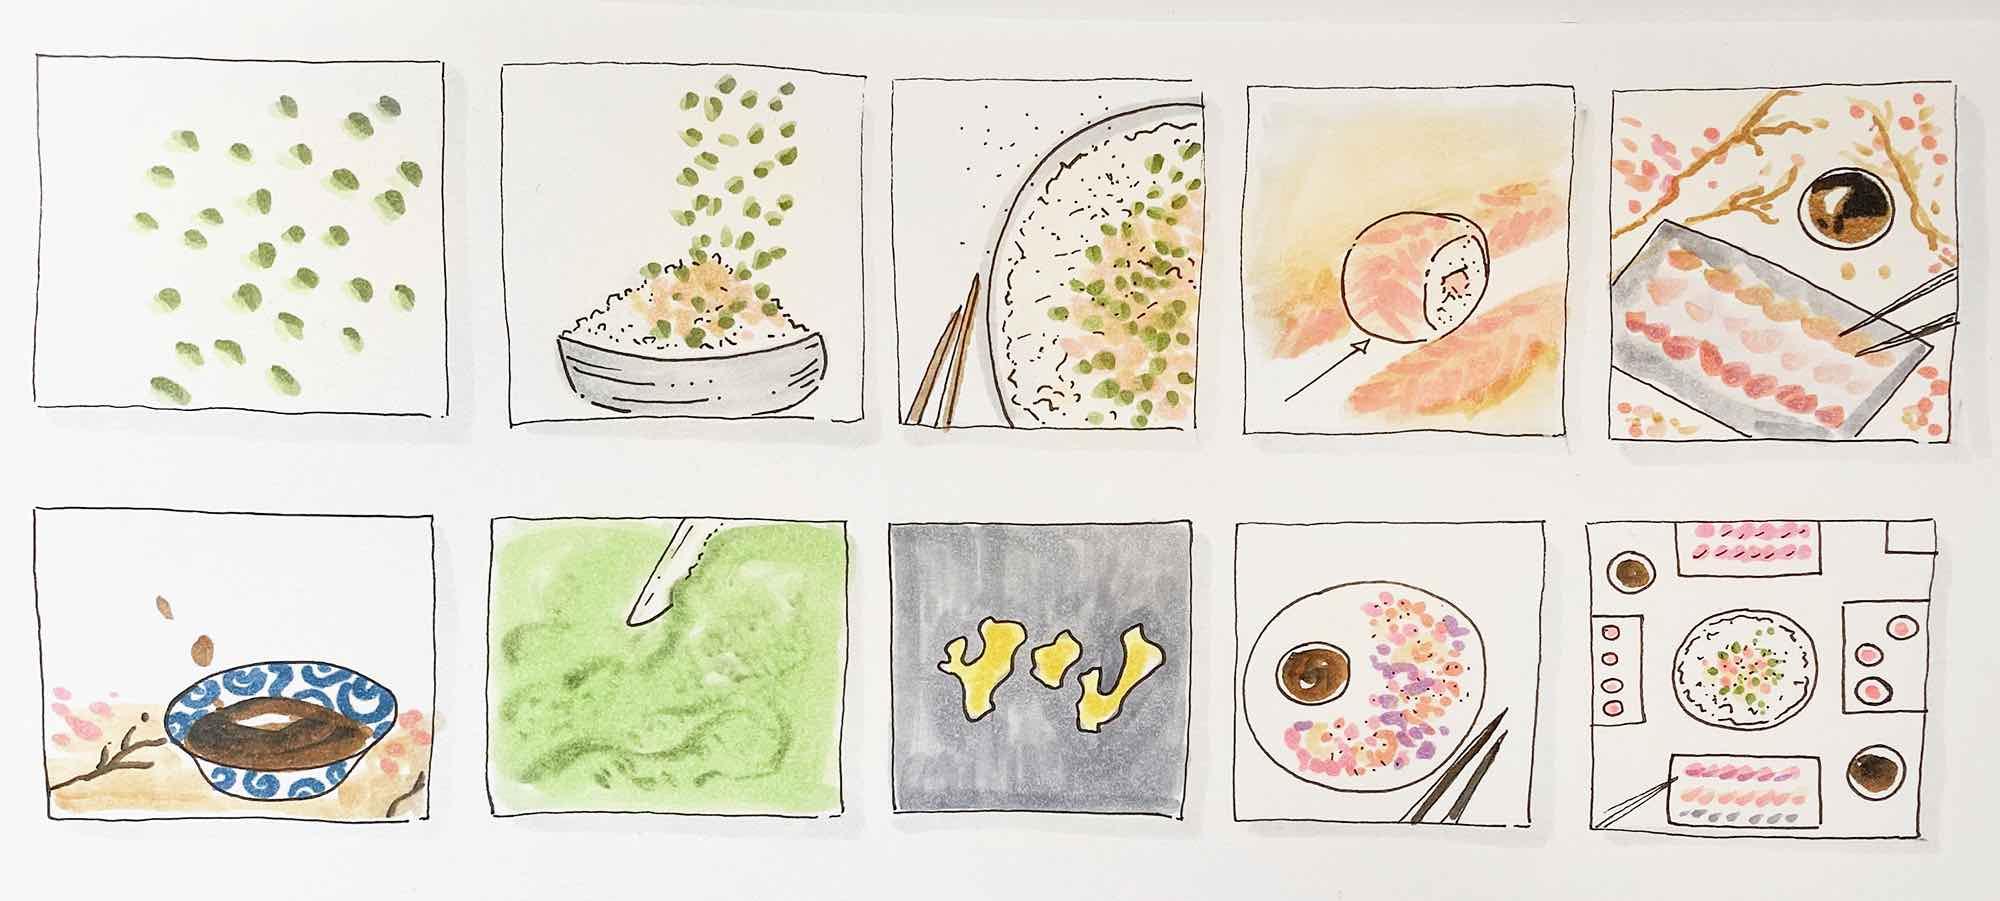 Storyboard Sushi Esselunga | WOWfood | www.wowfood.it